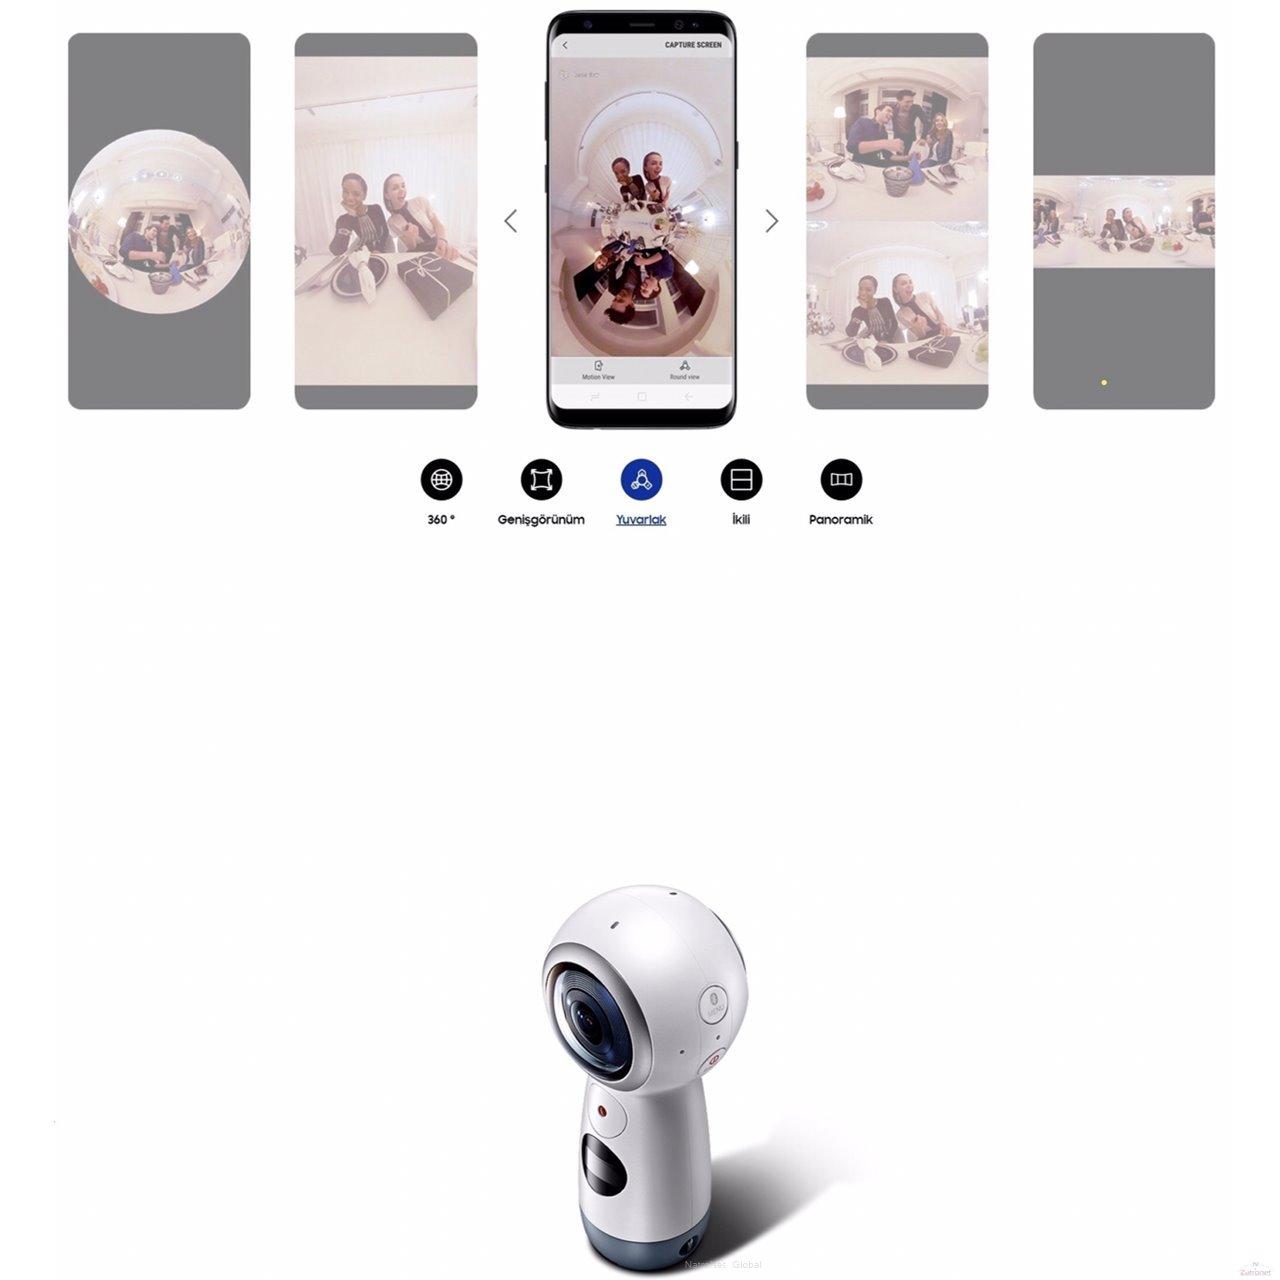 Samsung SM-R210 Gear Gerçek 360 4K VR Kamera